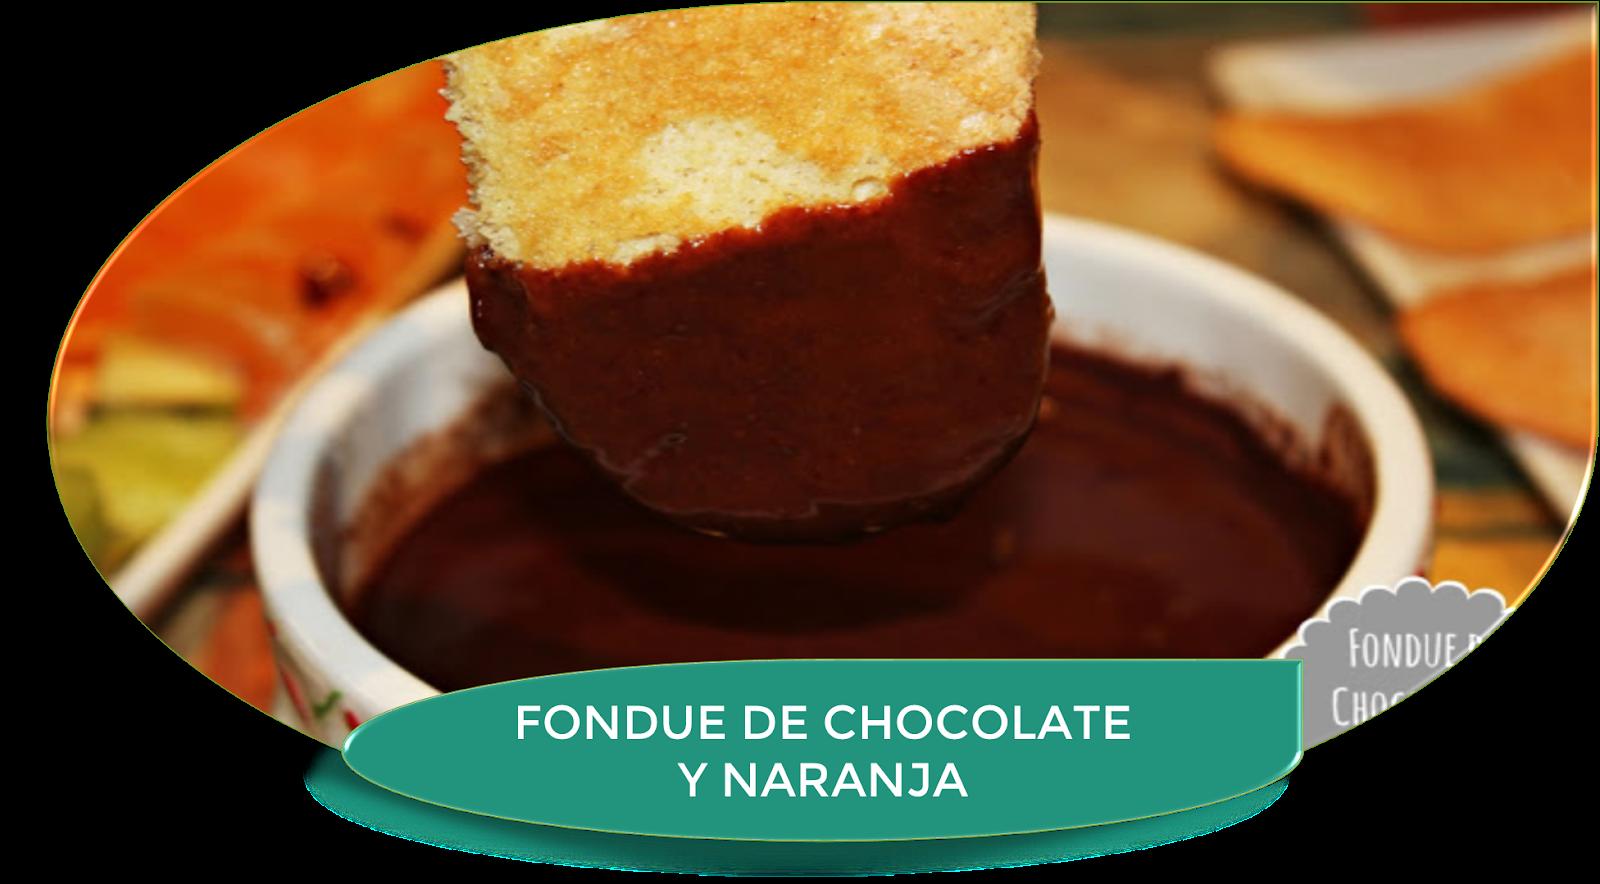 FONDUE DE CHOCOLATE Y NARANJA